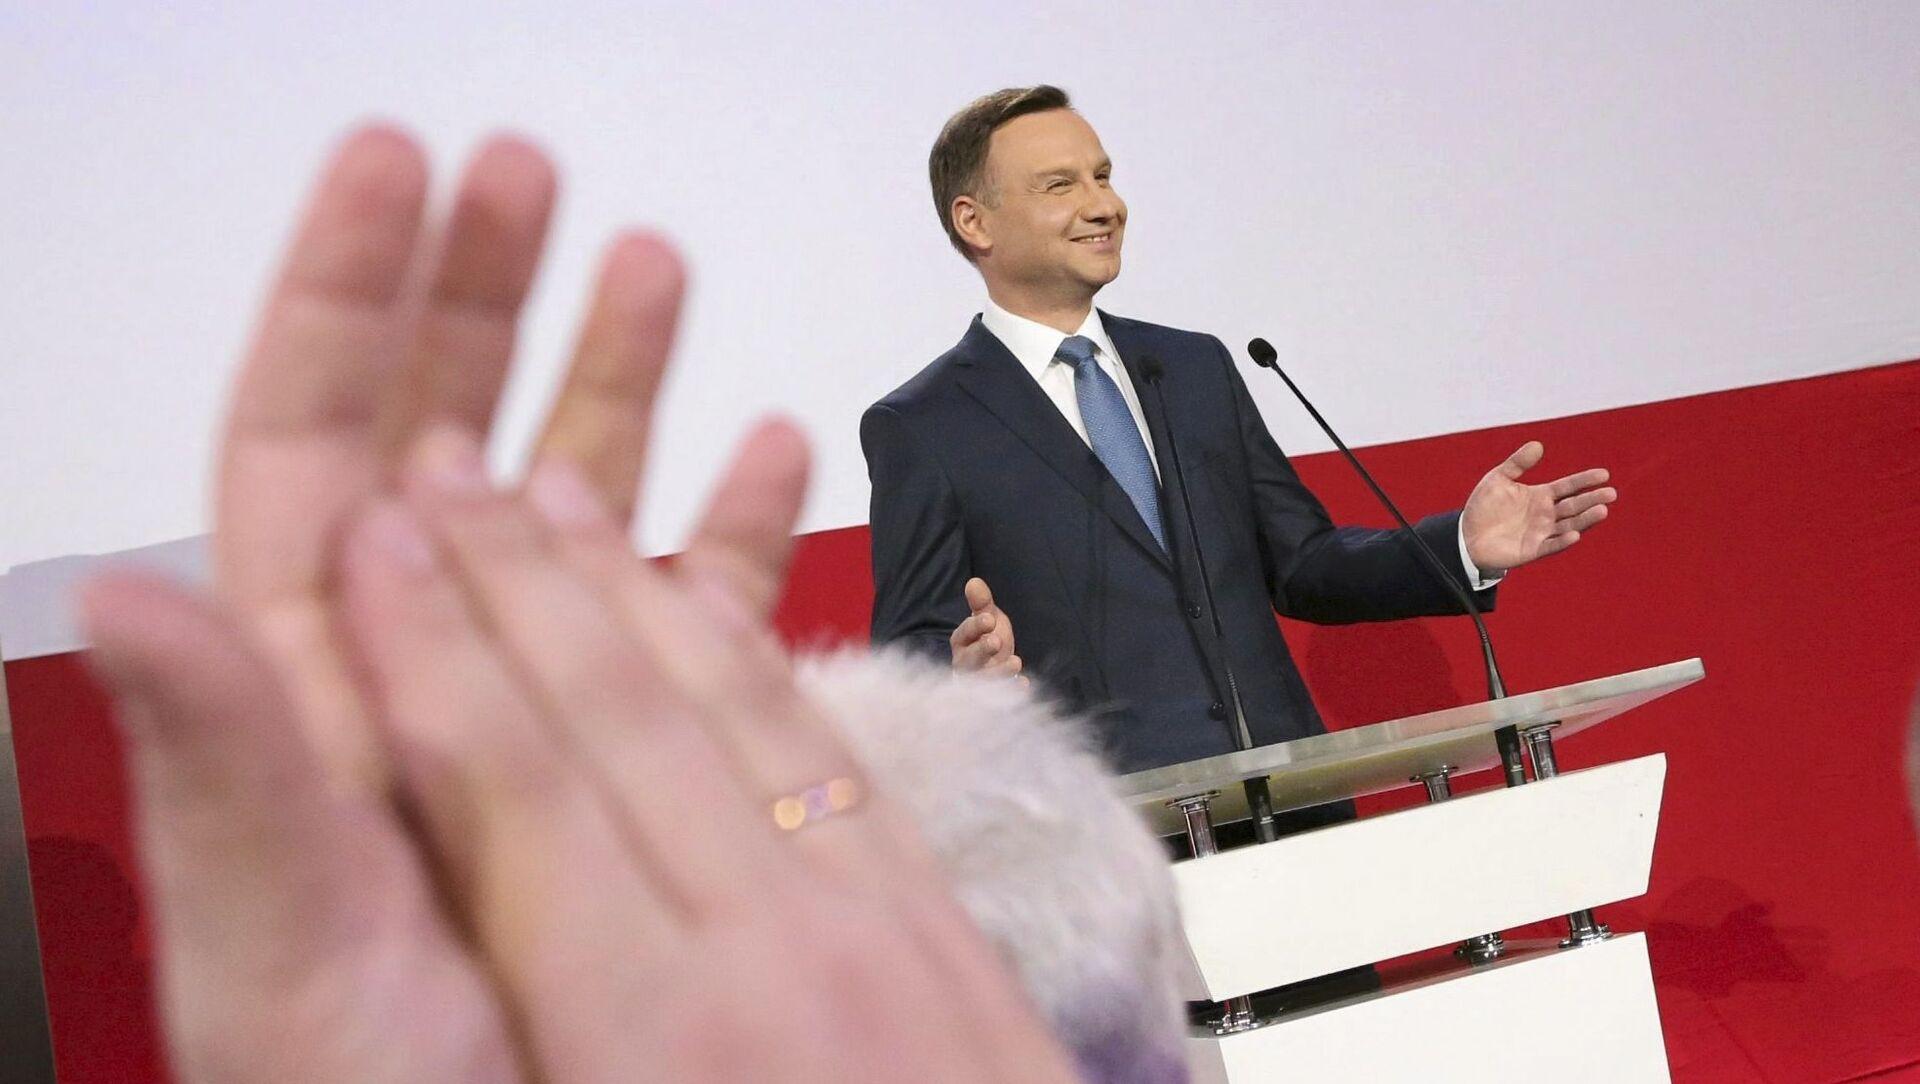 Prezydent elekt RP Andrzej Duda - Sputnik Polska, 1920, 17.05.2021